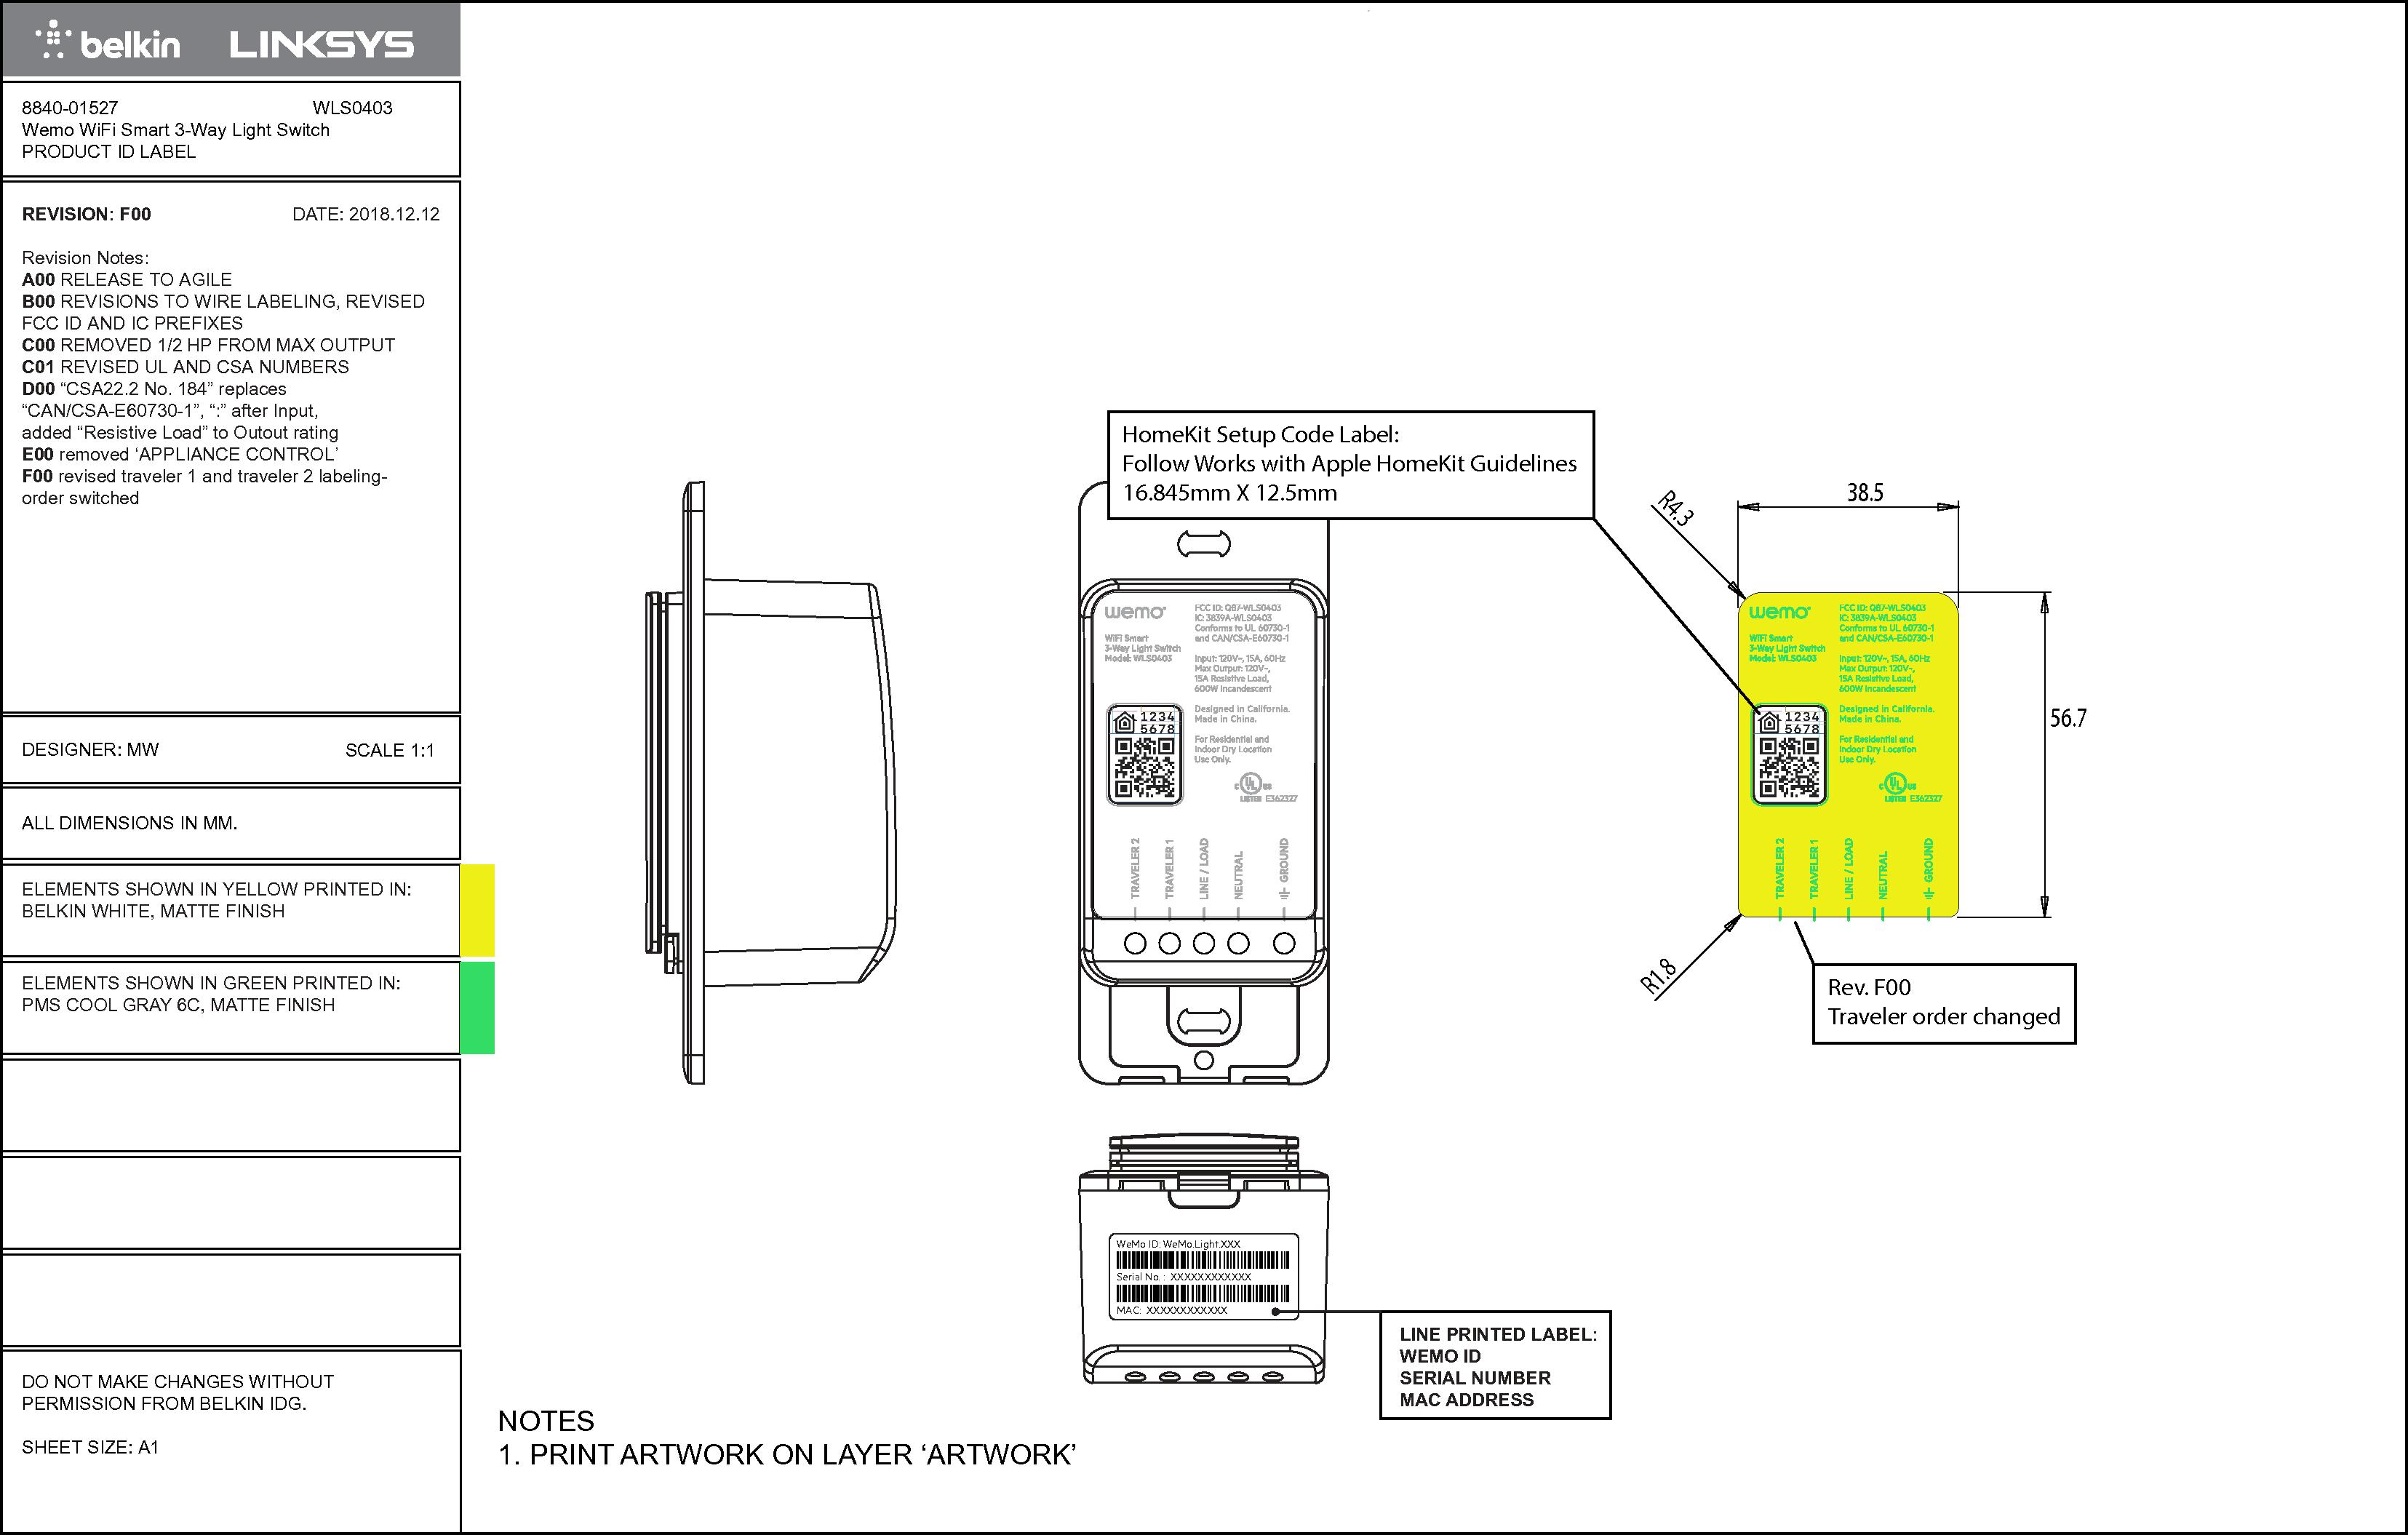 Csco Linksys Llc Wifi Smart 3 Way Light Switch Wls